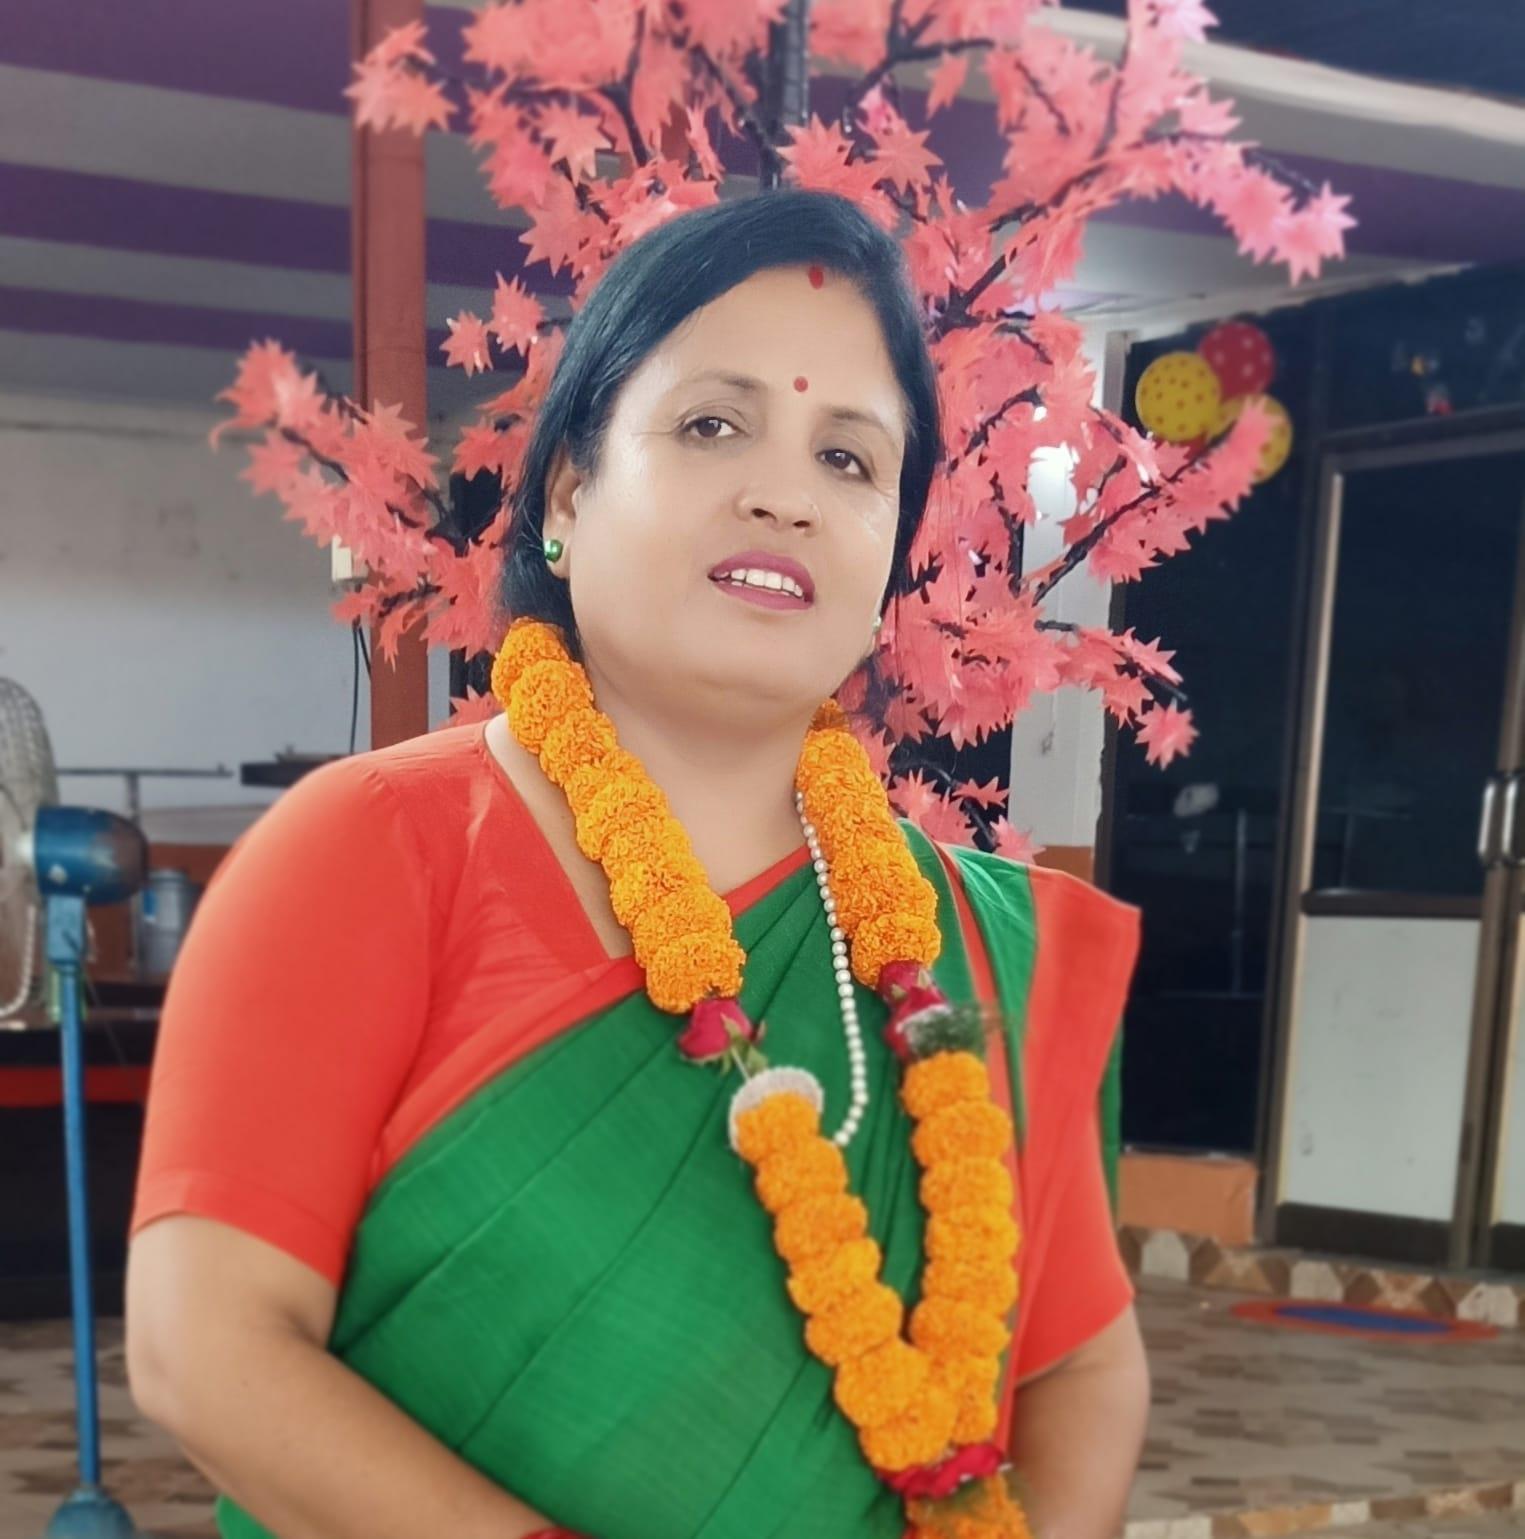 अखिल नेपाल महिला सङ्घ सुनसरी जिल्ला इन्चार्जमा लक्ष्मी गौतम चयन